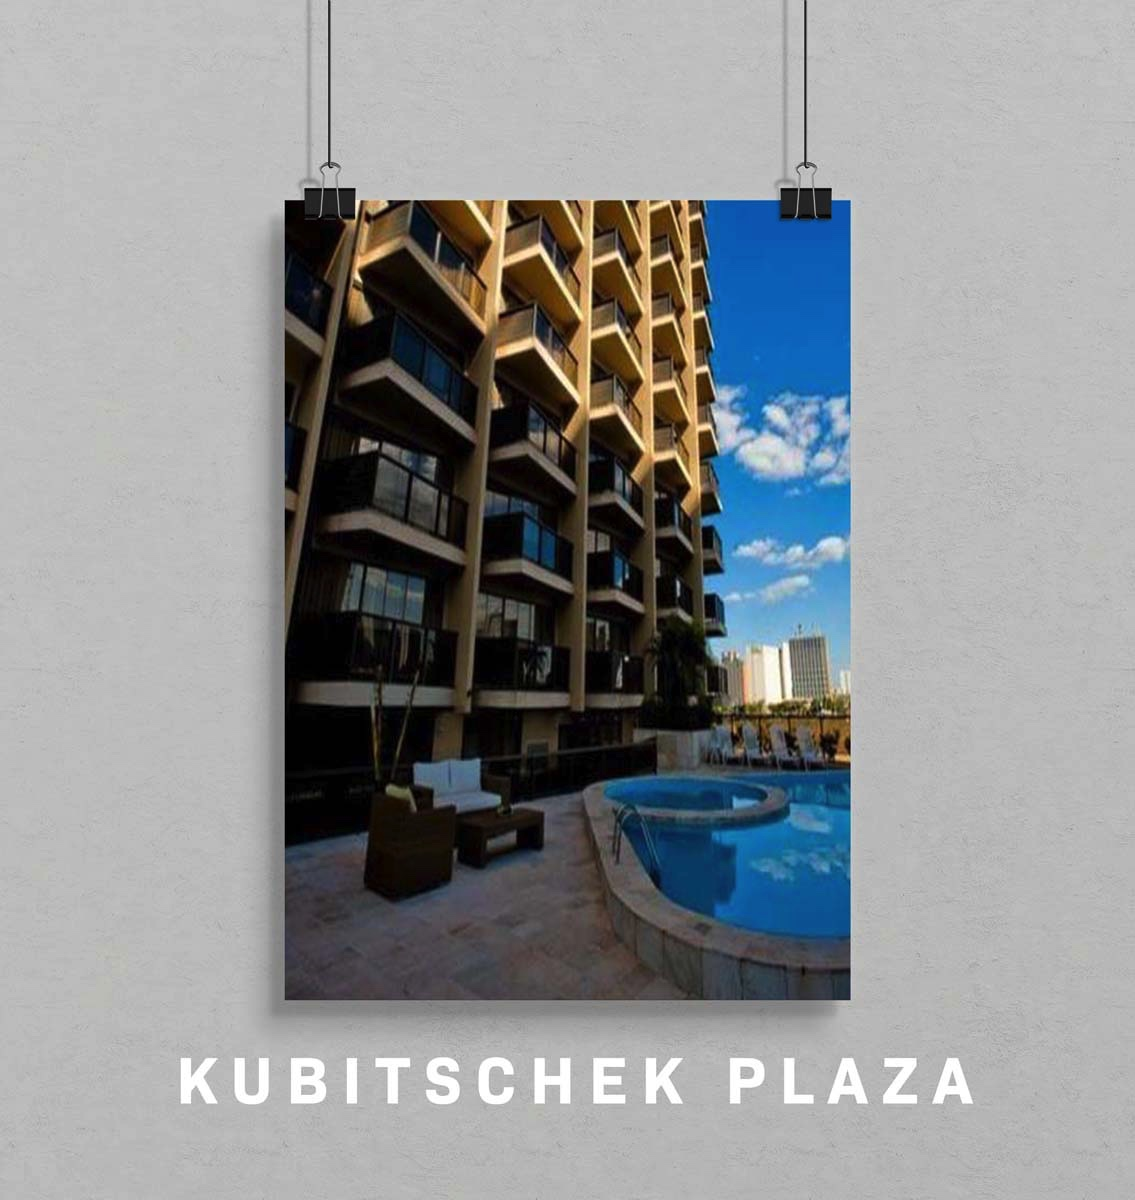 Kubistschek Plaza